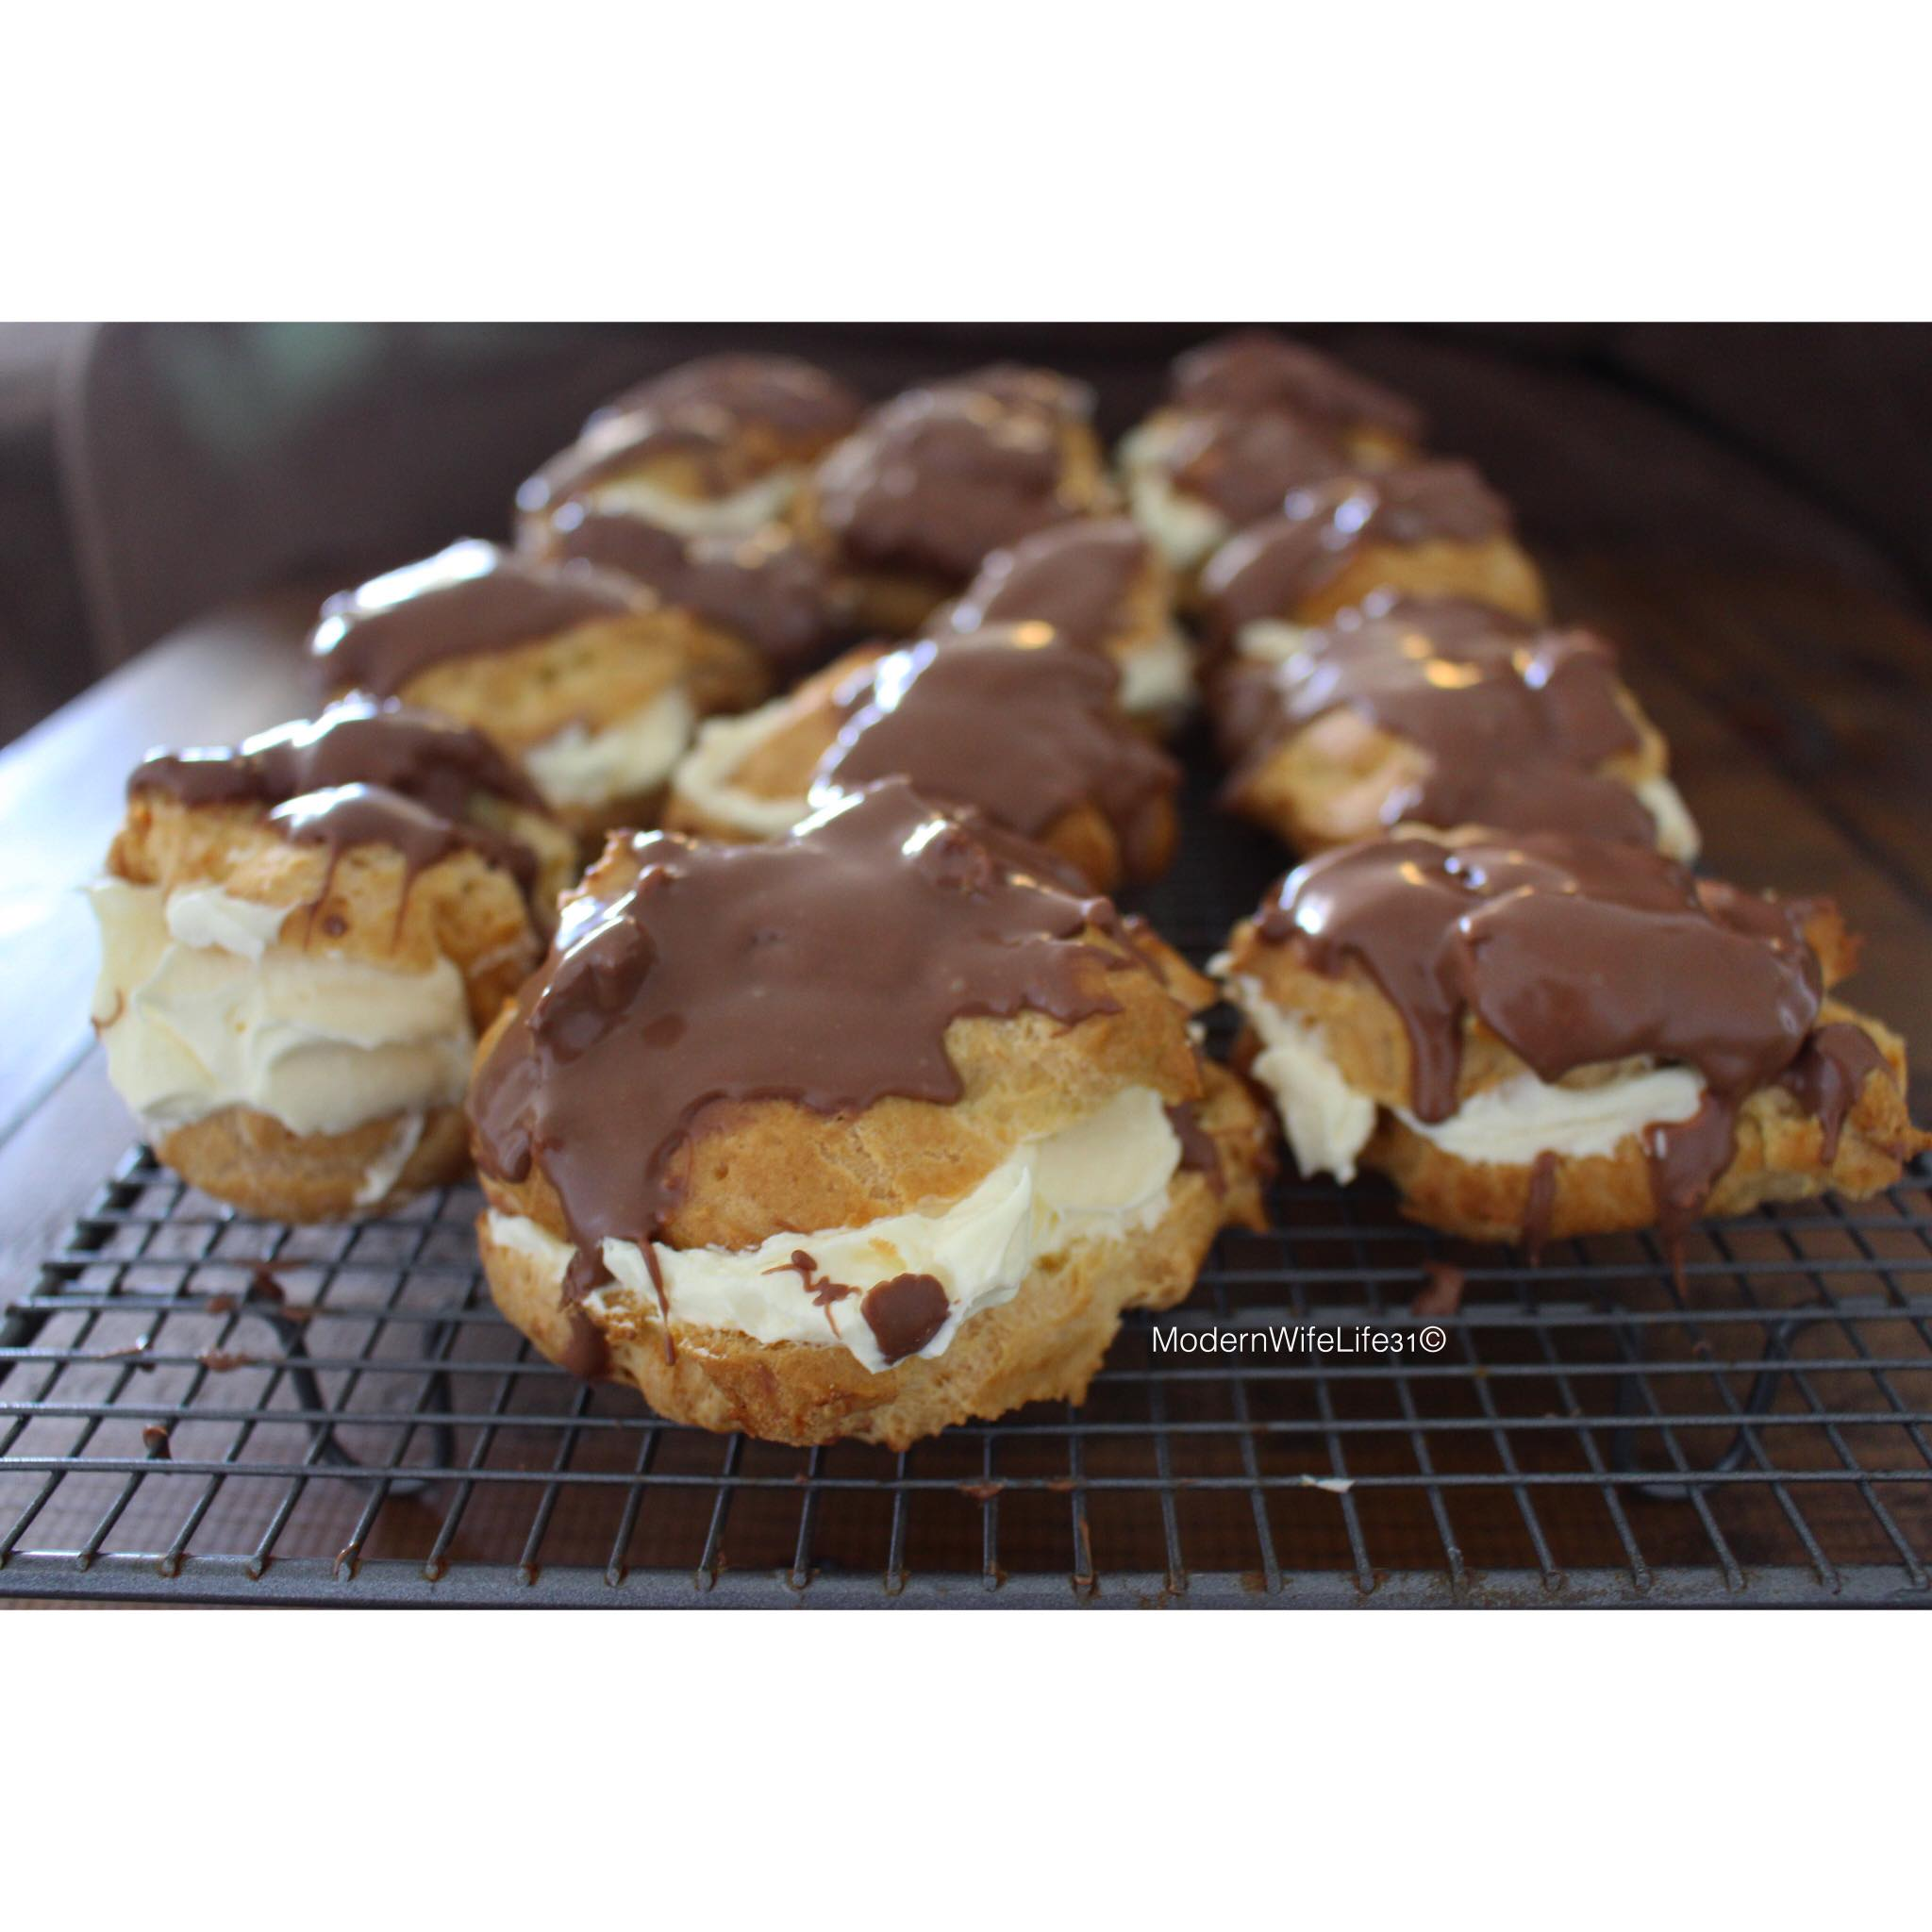 chocolate eclairs modernwifelife31